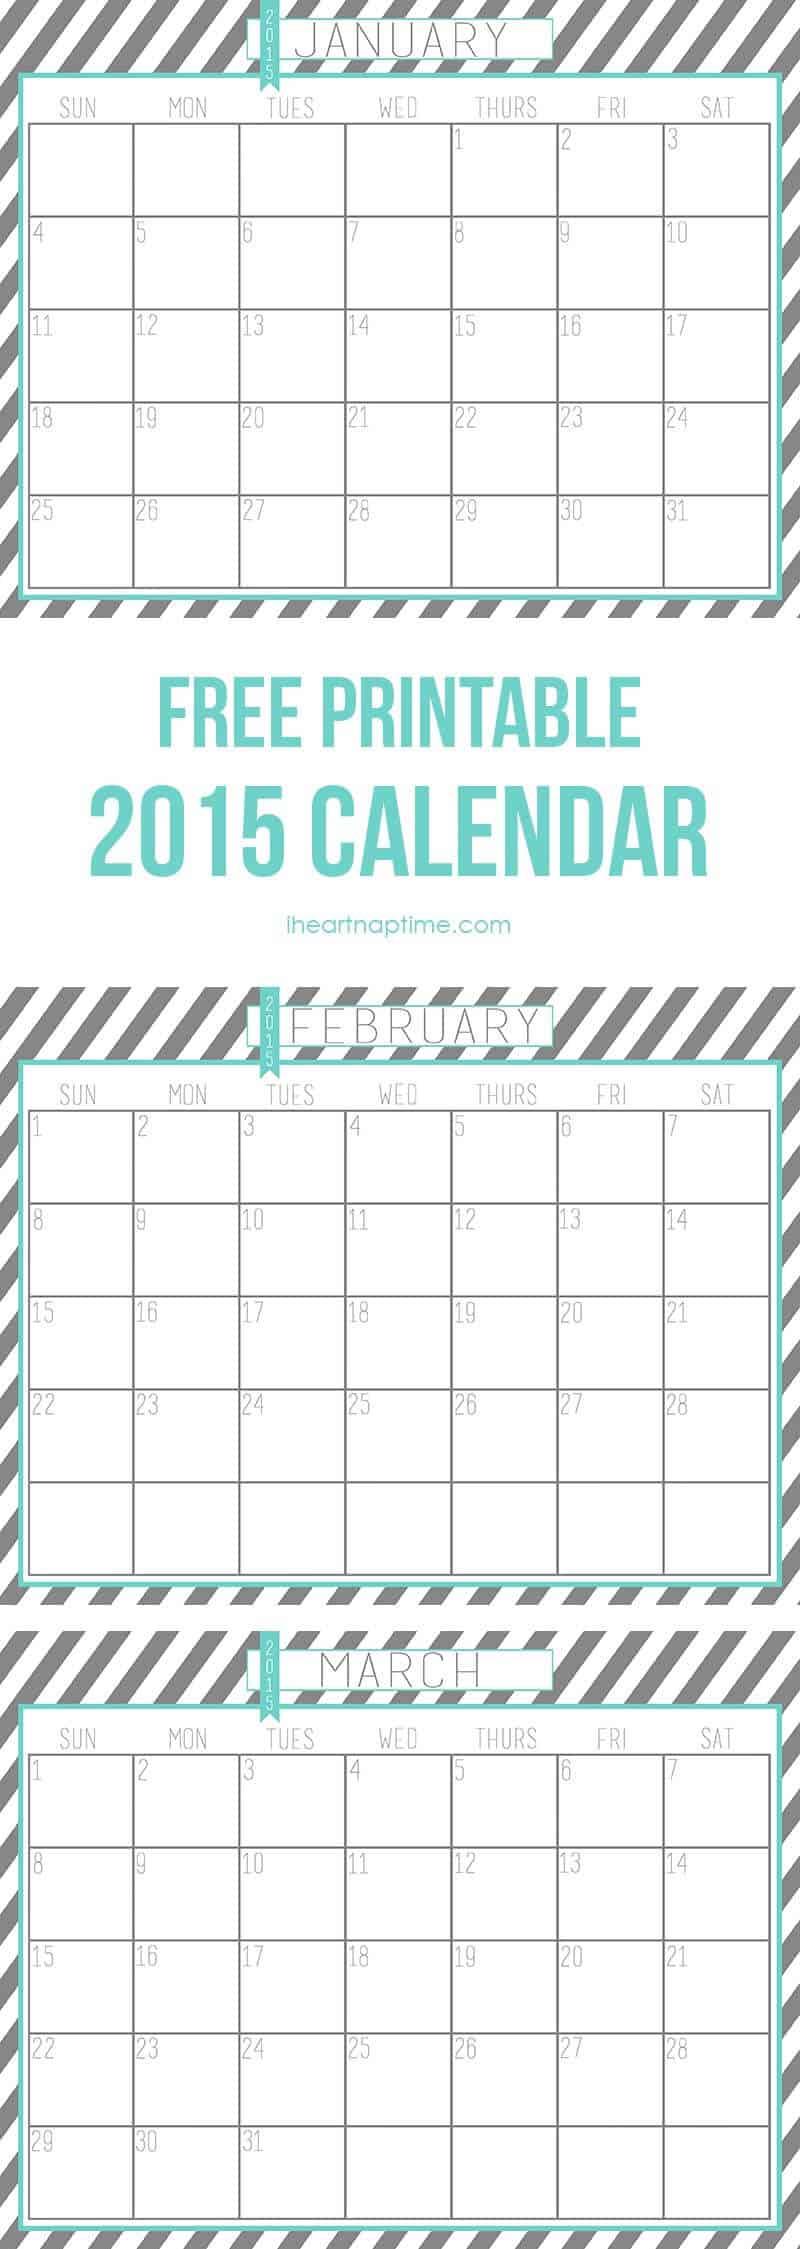 printable 2015 calendar by month - Winkd.co